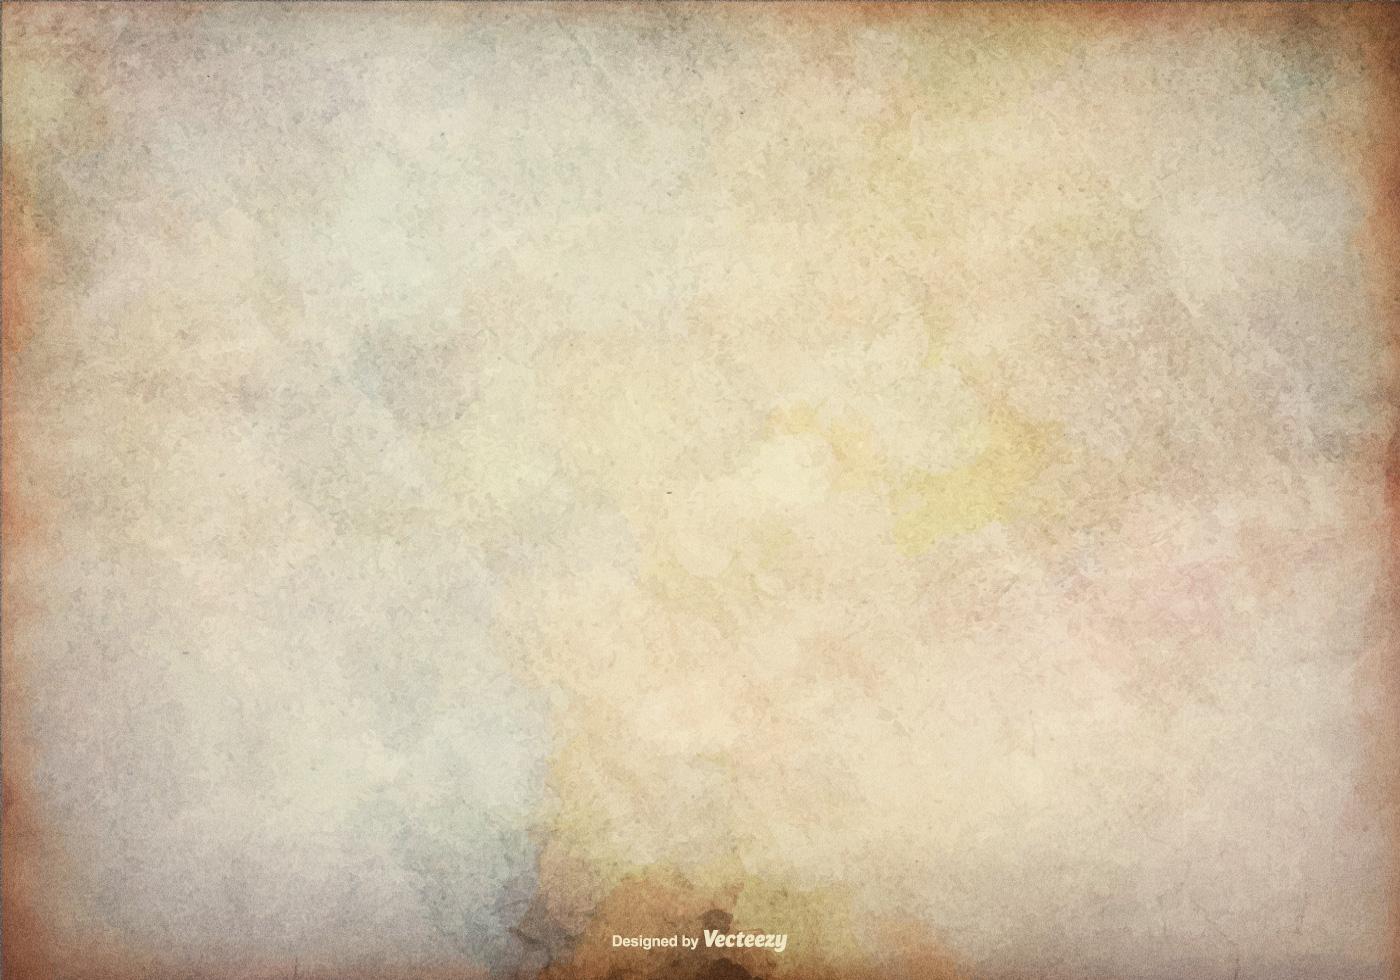 Vector Grunge Background Texture Download Free Vector